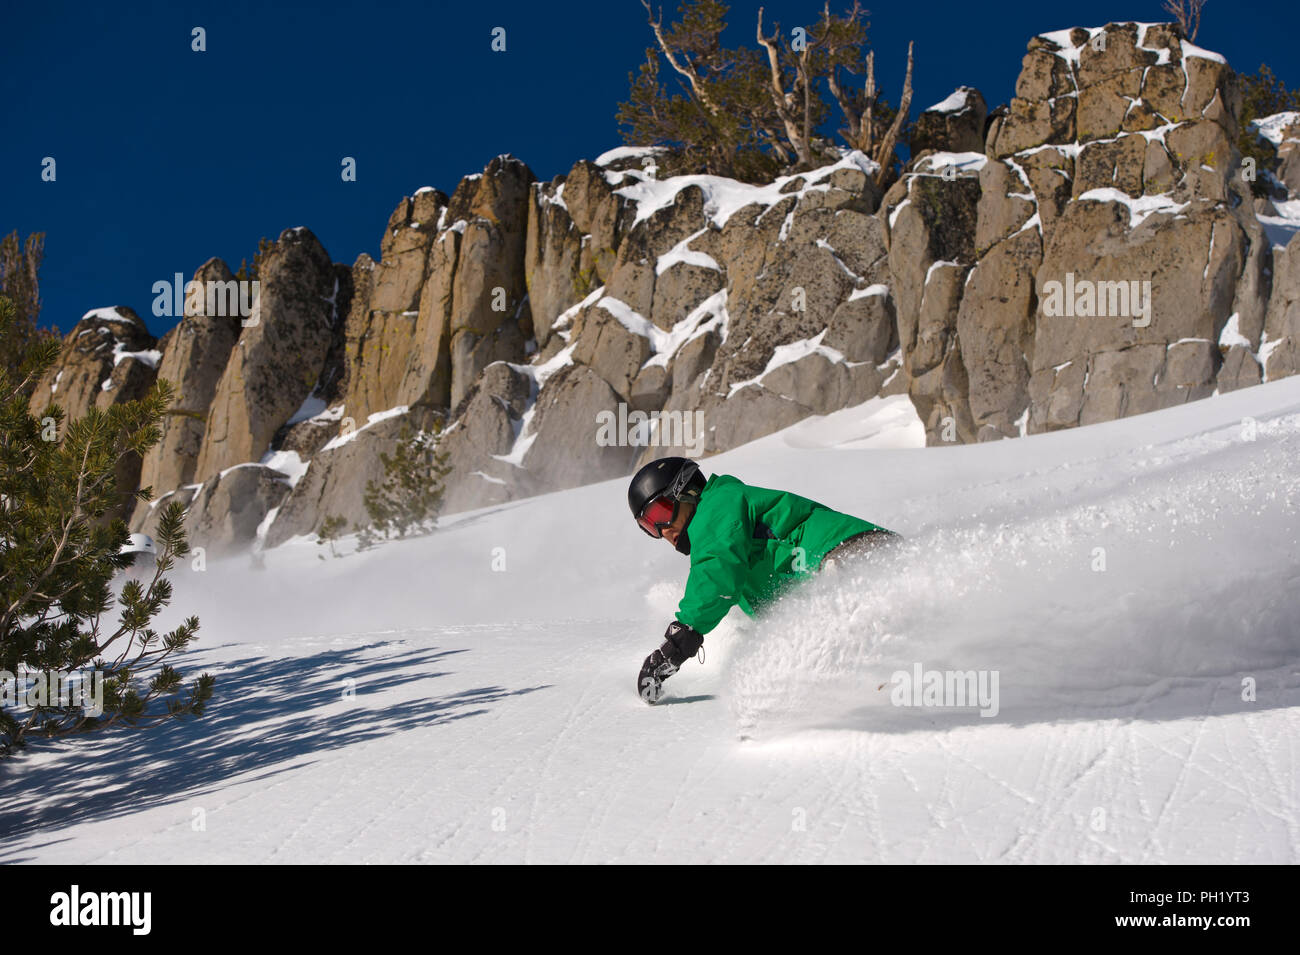 Groomers at Mt. Rose Ski Tahoe - 2012 Stock Photo